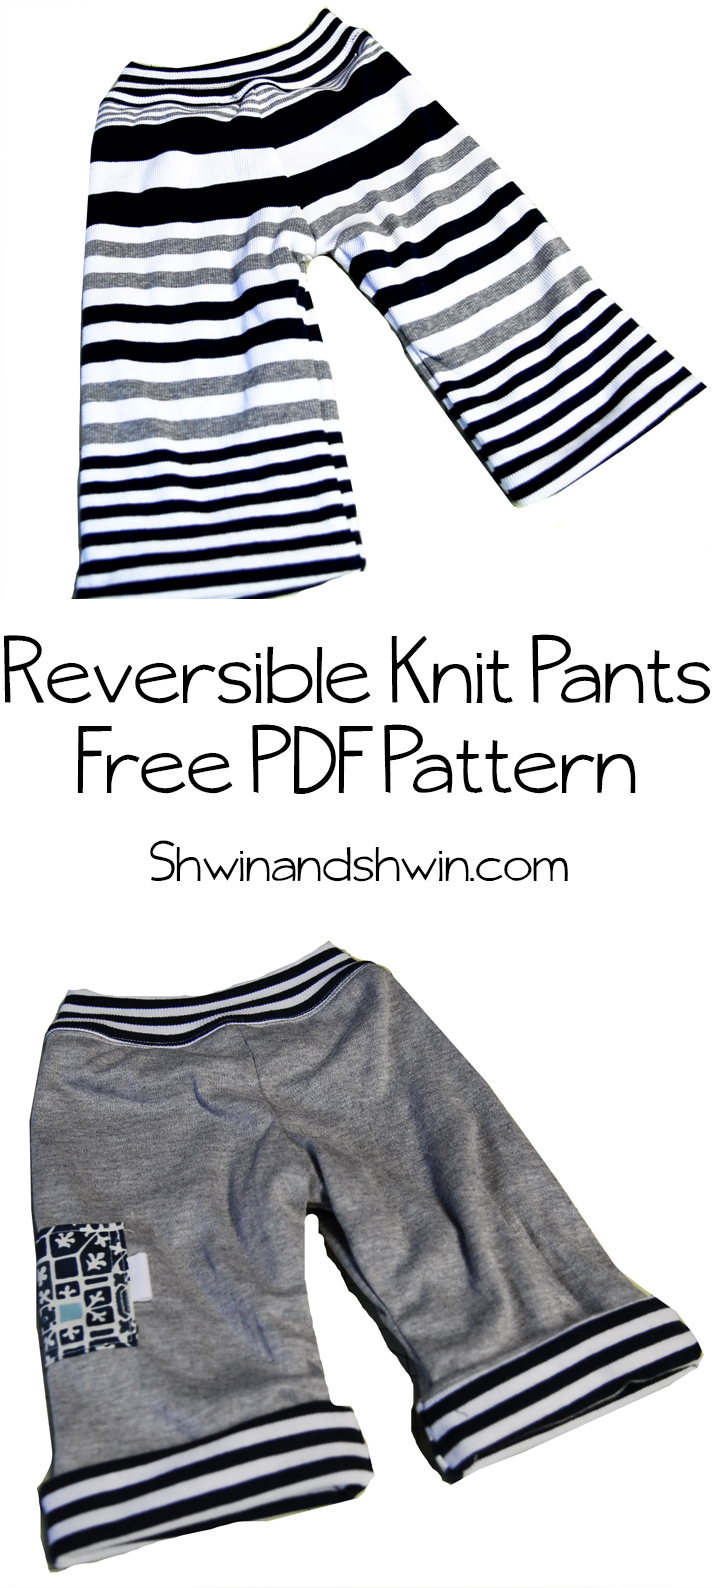 Reversible knit baby pants {with pdf pattern}